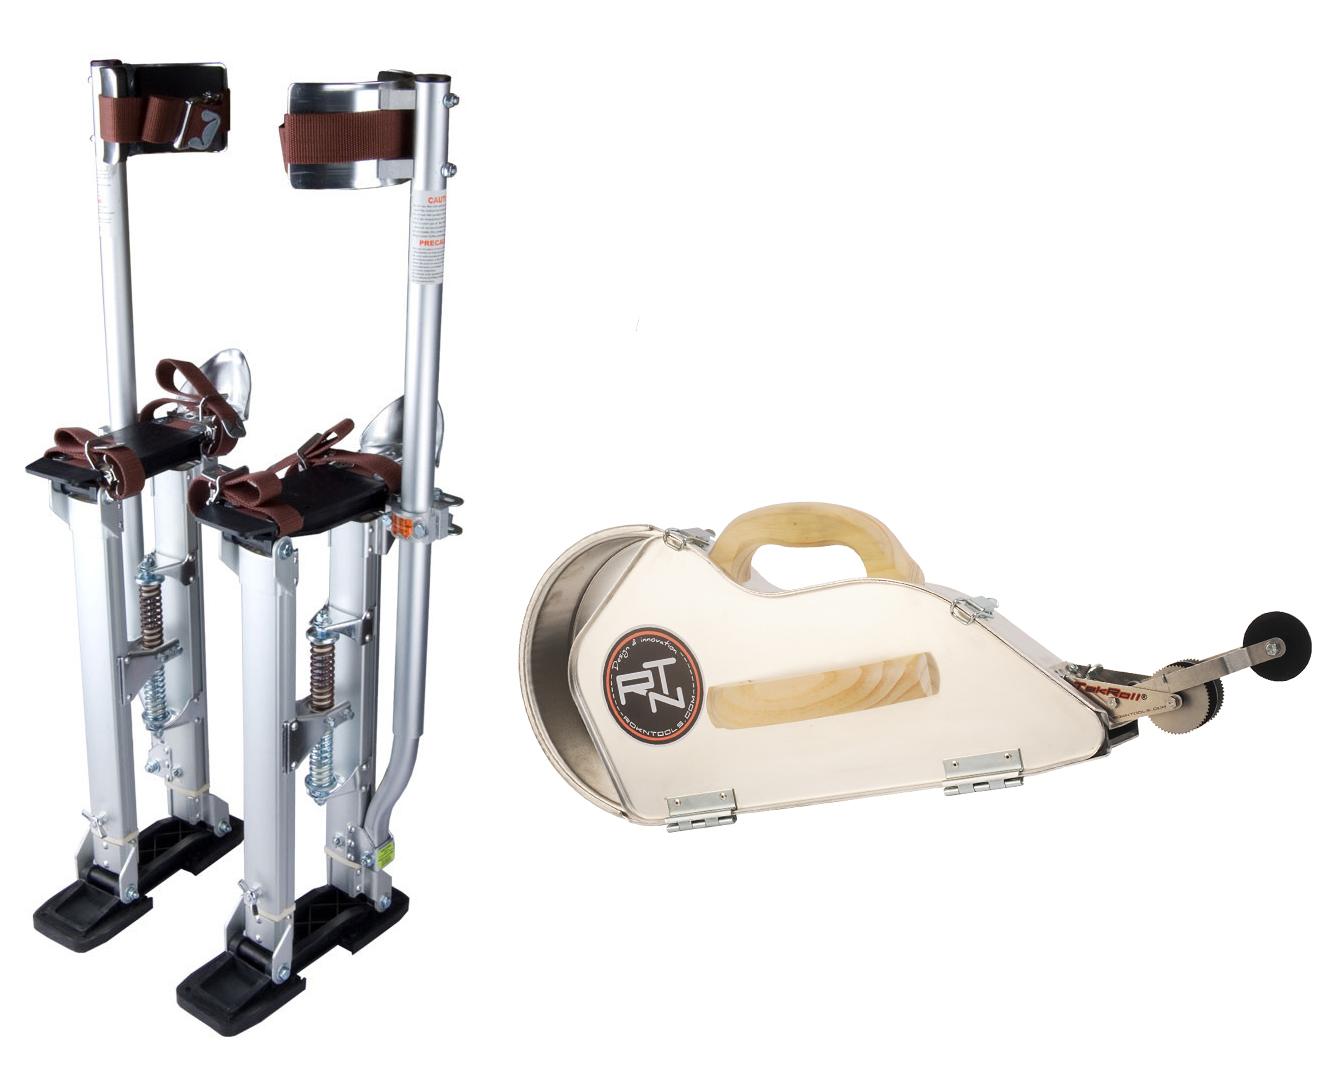 kit chasses 38 58 cm banjo aluminium et sa roulette. Black Bedroom Furniture Sets. Home Design Ideas